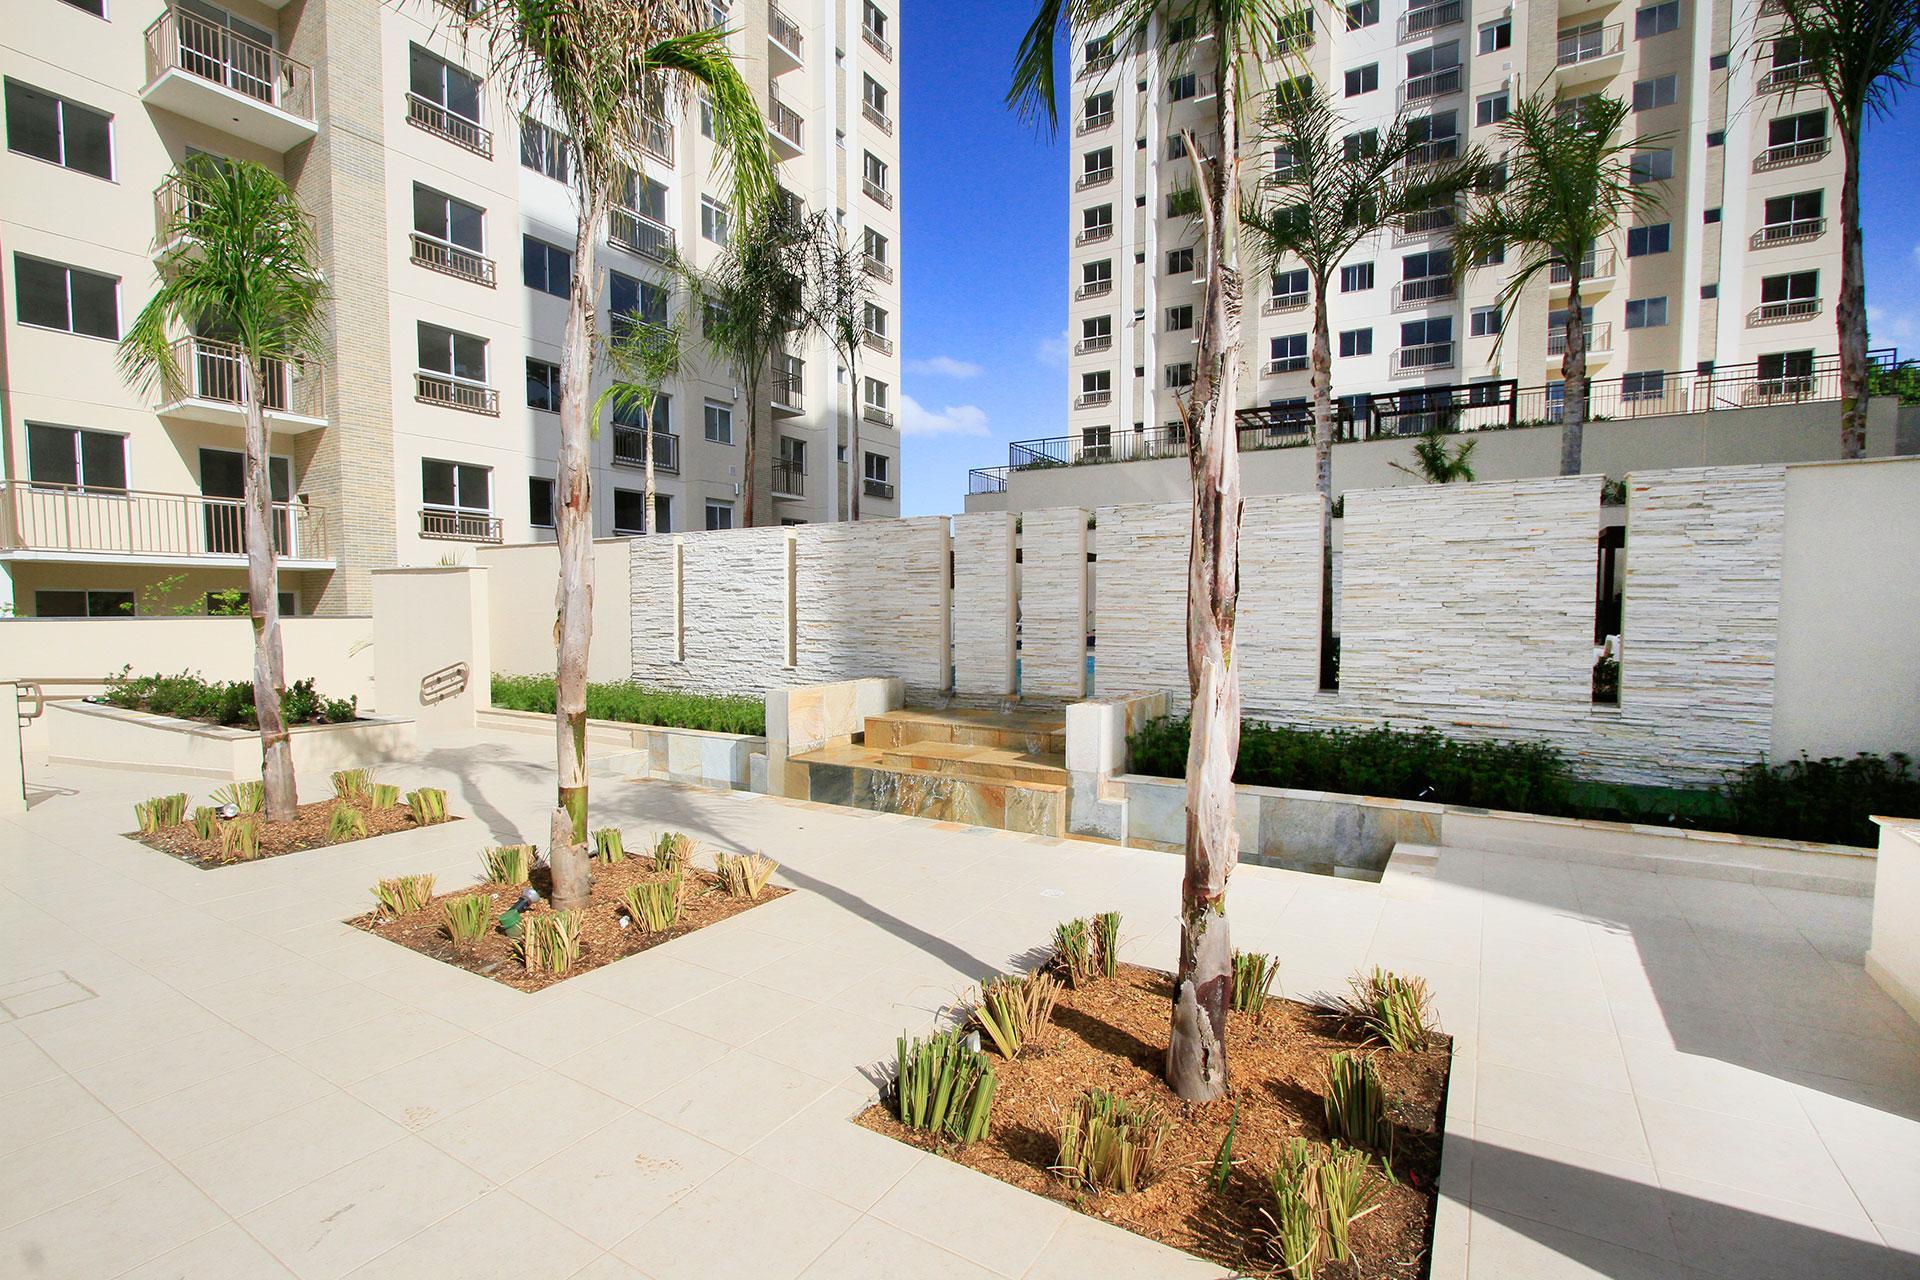 Entrada | Ideale Residencial – Apartamentono  Santa Quitéria - Curitiba - Paraná